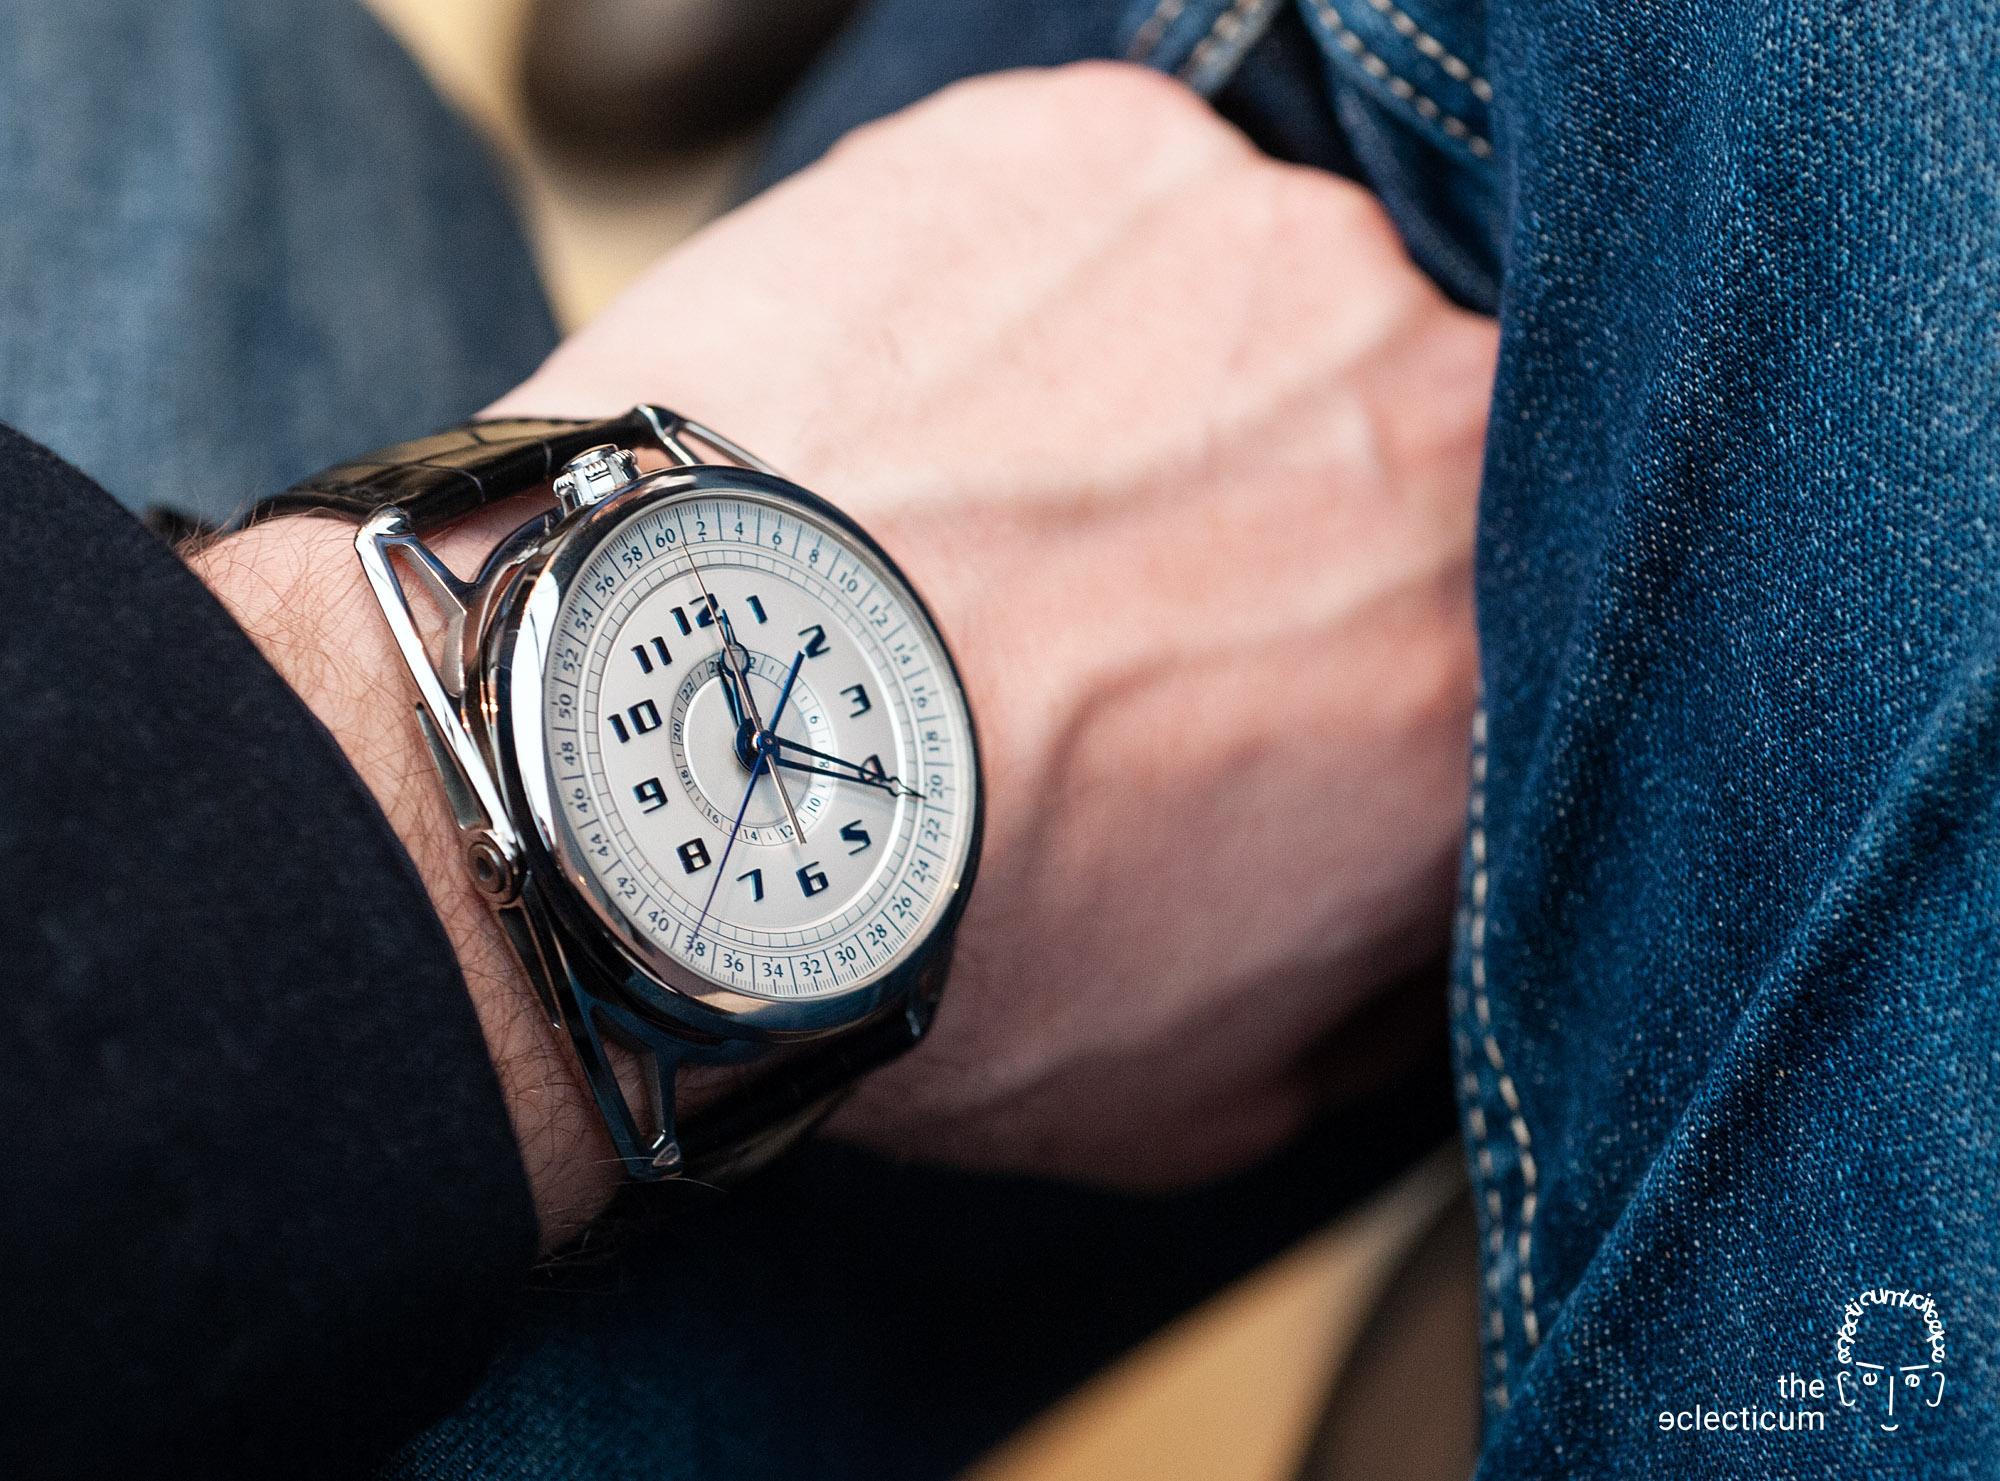 De Bethune DB28 MaxiChrono chronograph central stack manufacture wristshot